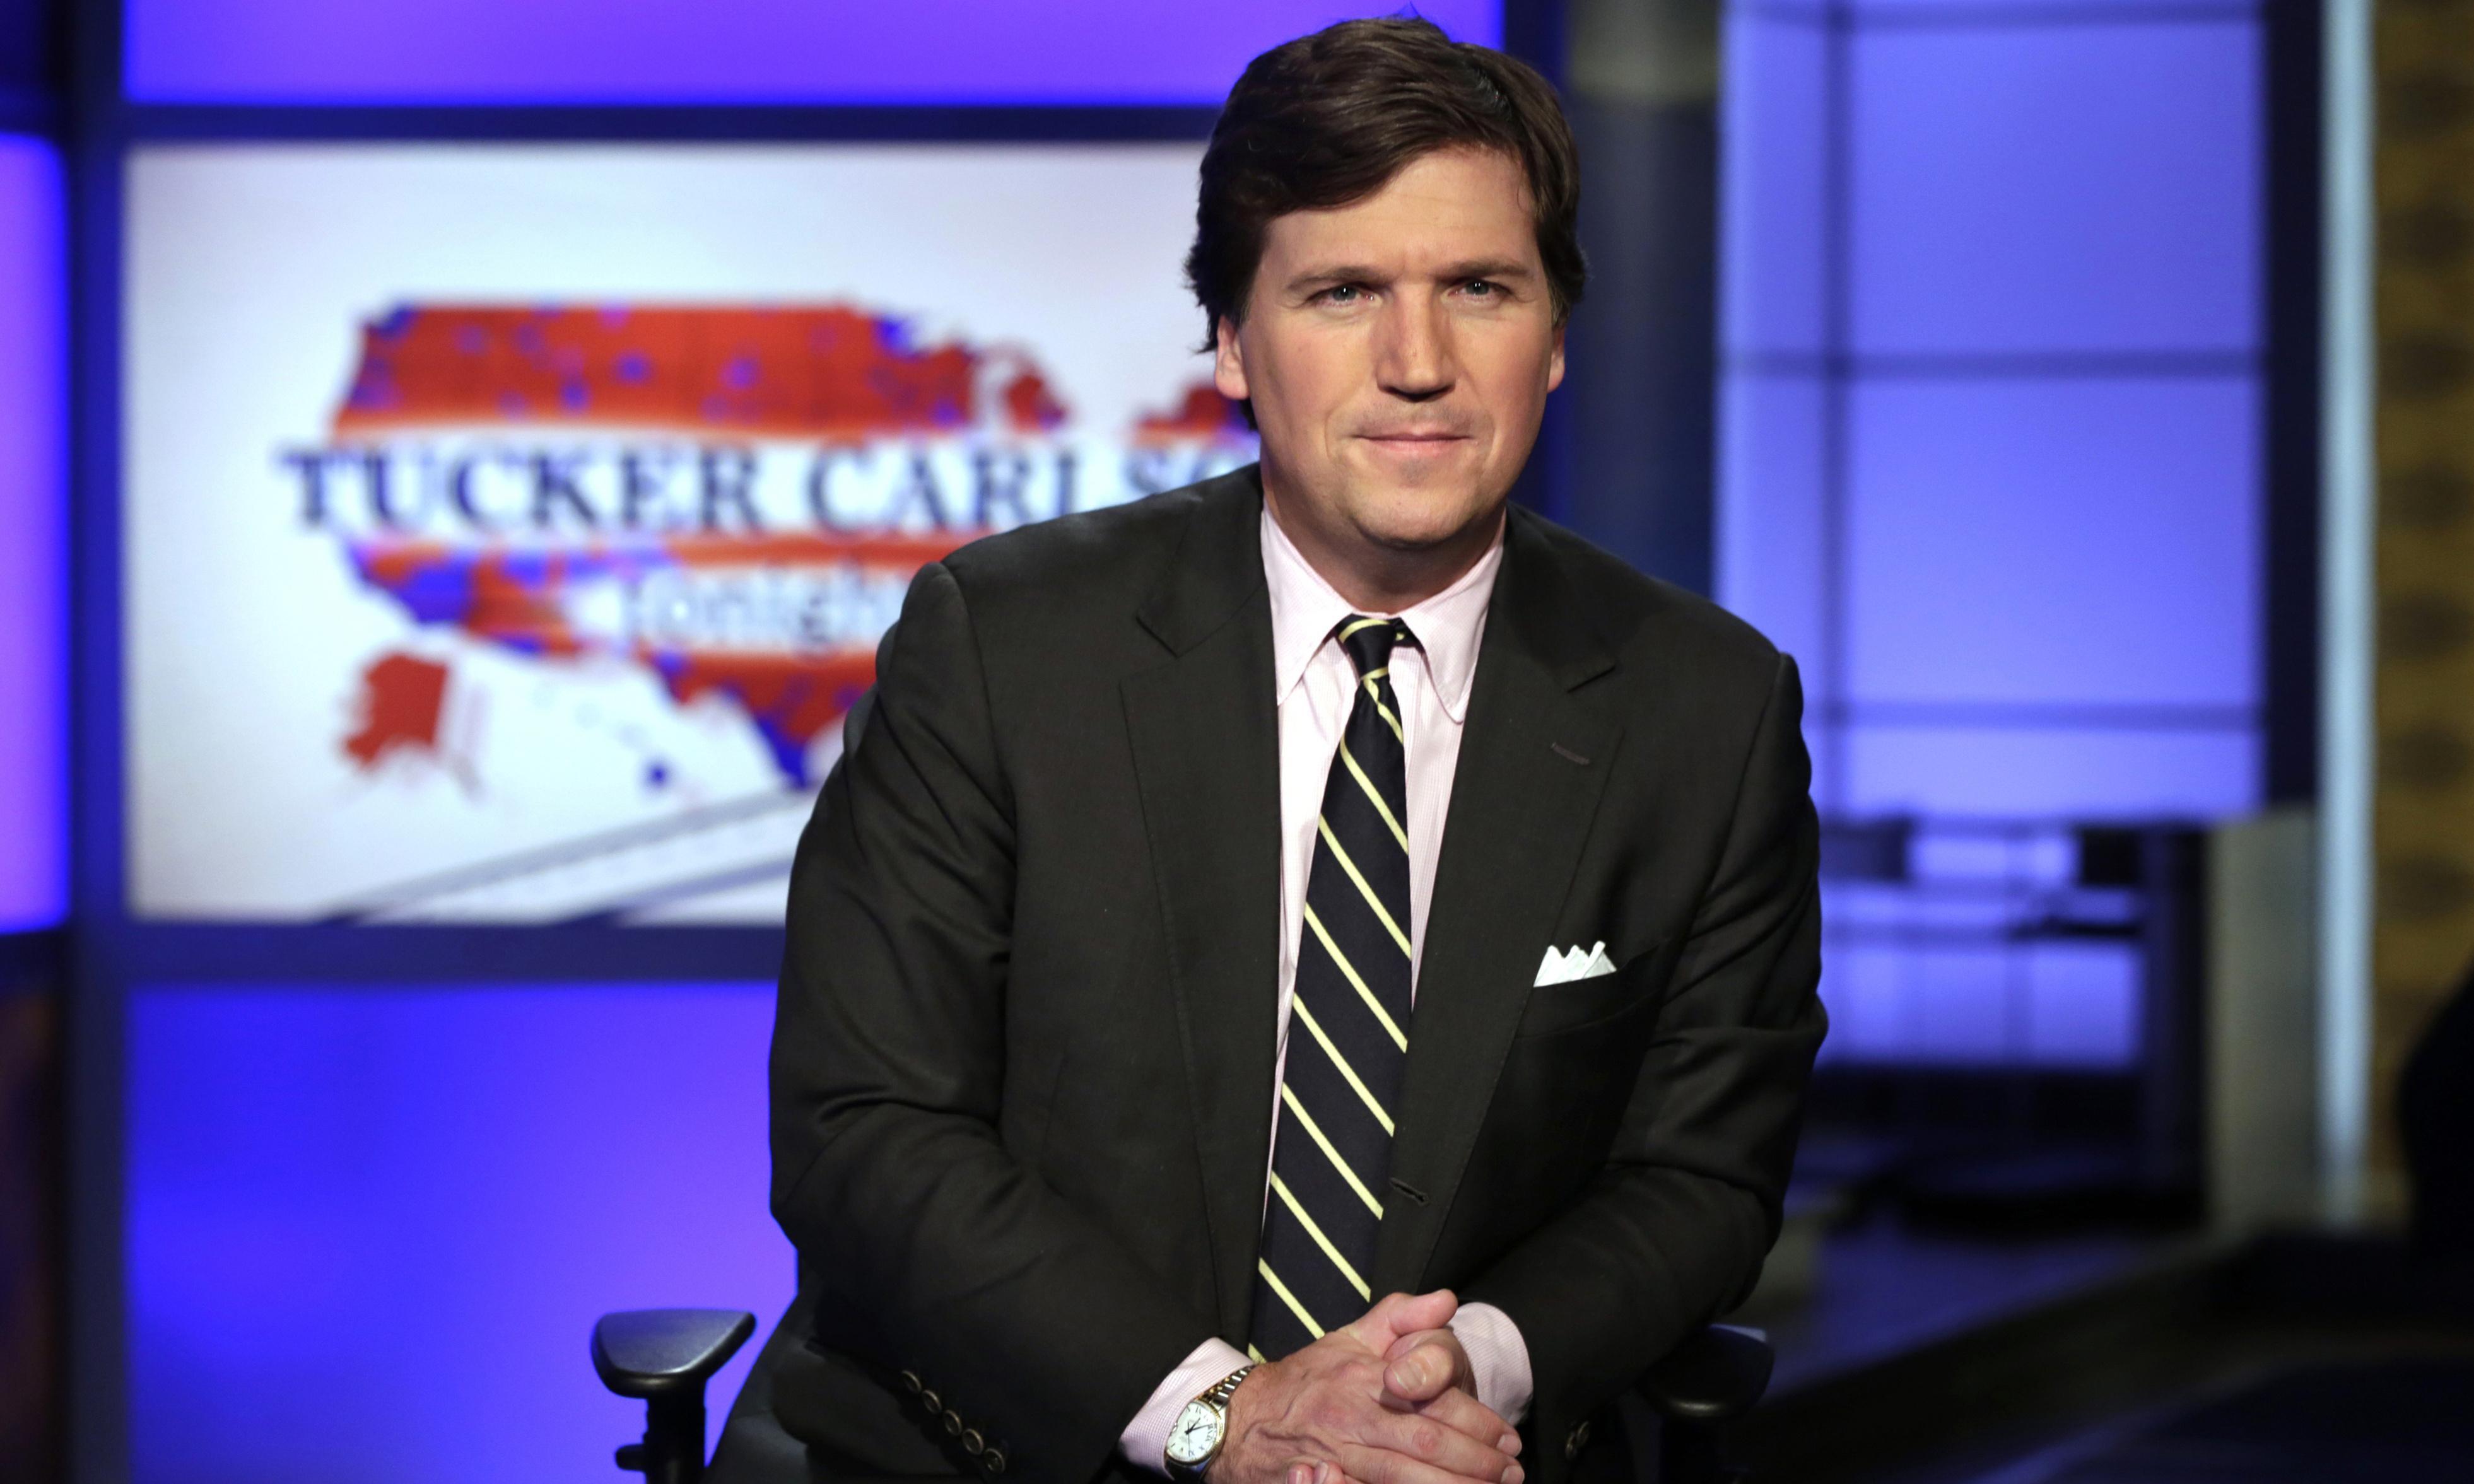 Fox News host Tucker Carlson: Putin does not hate America like liberals do